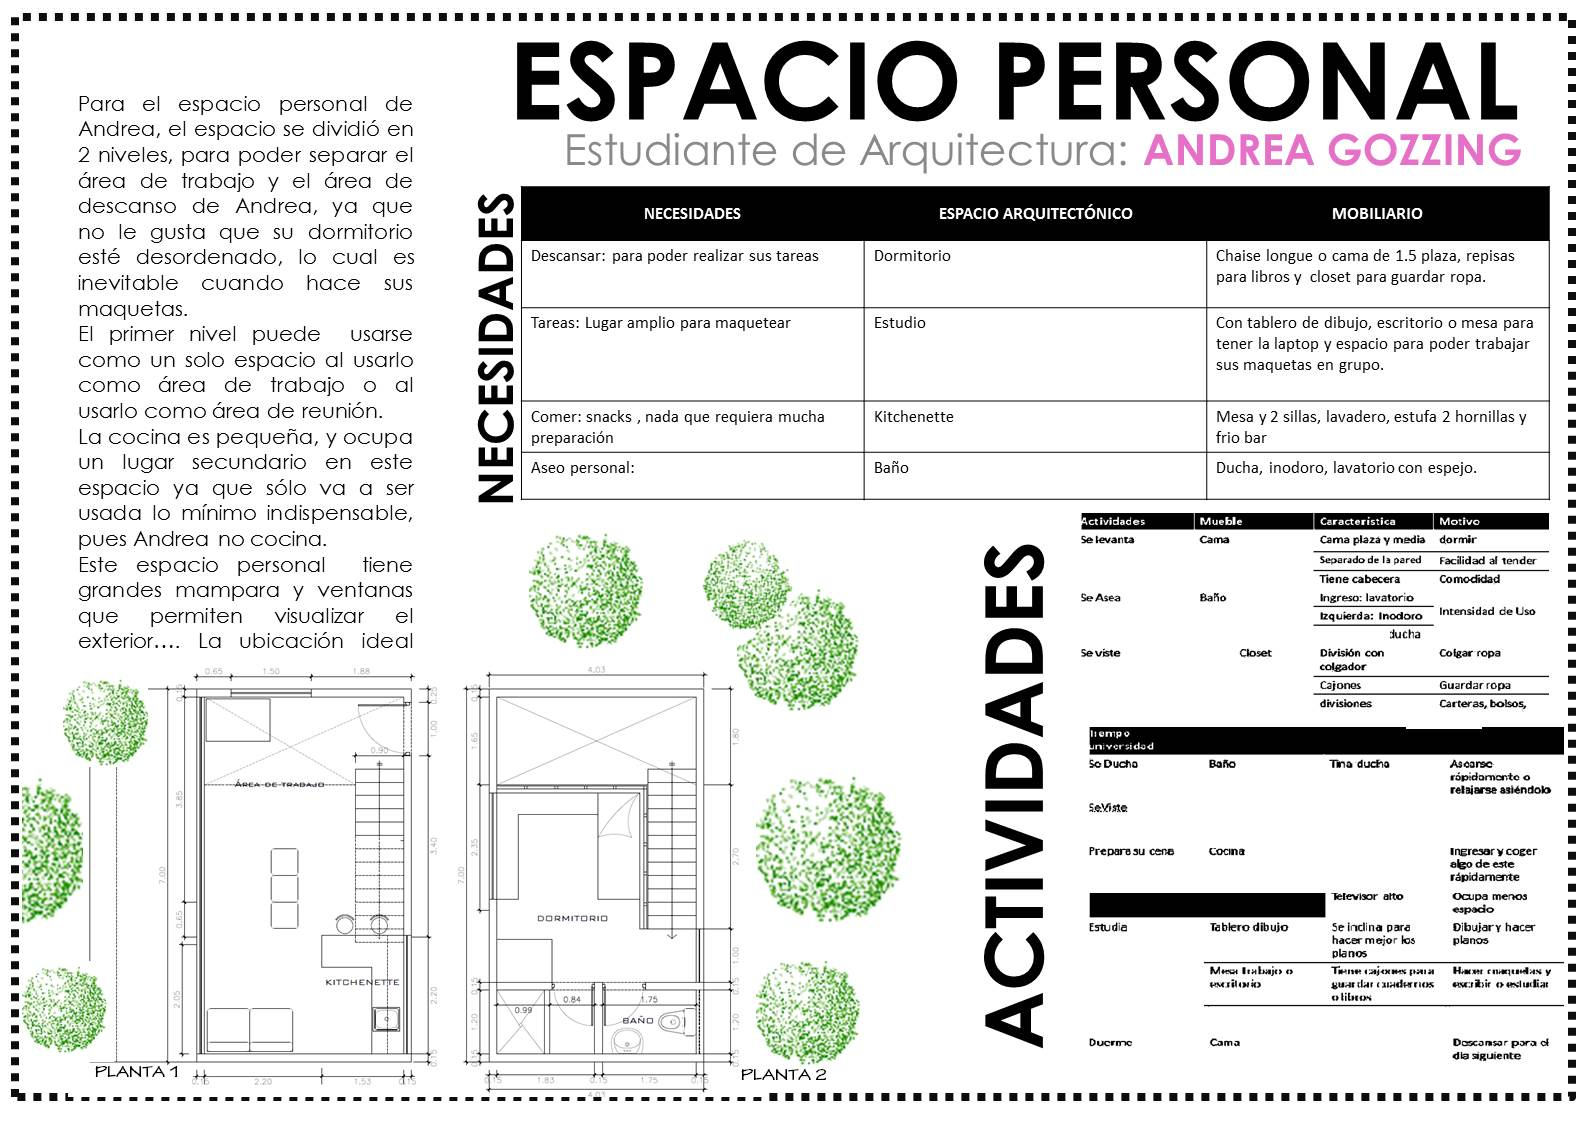 Introduccion a la arquitectura for Programa de necesidades arquitectura